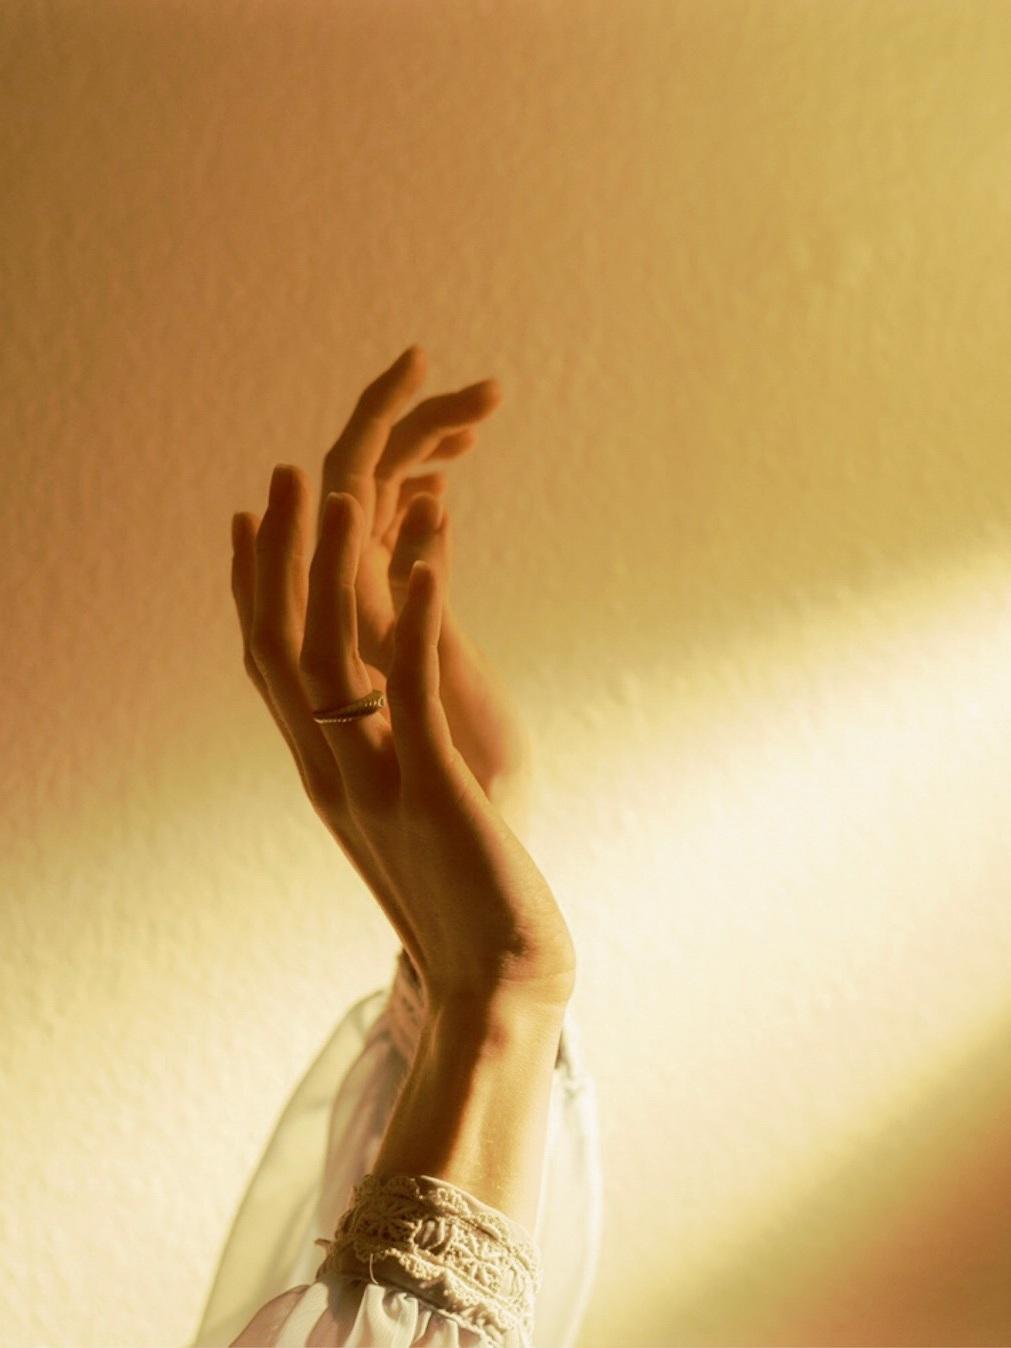 Hand Photo - Light  - www.robbiegene.com.jpg